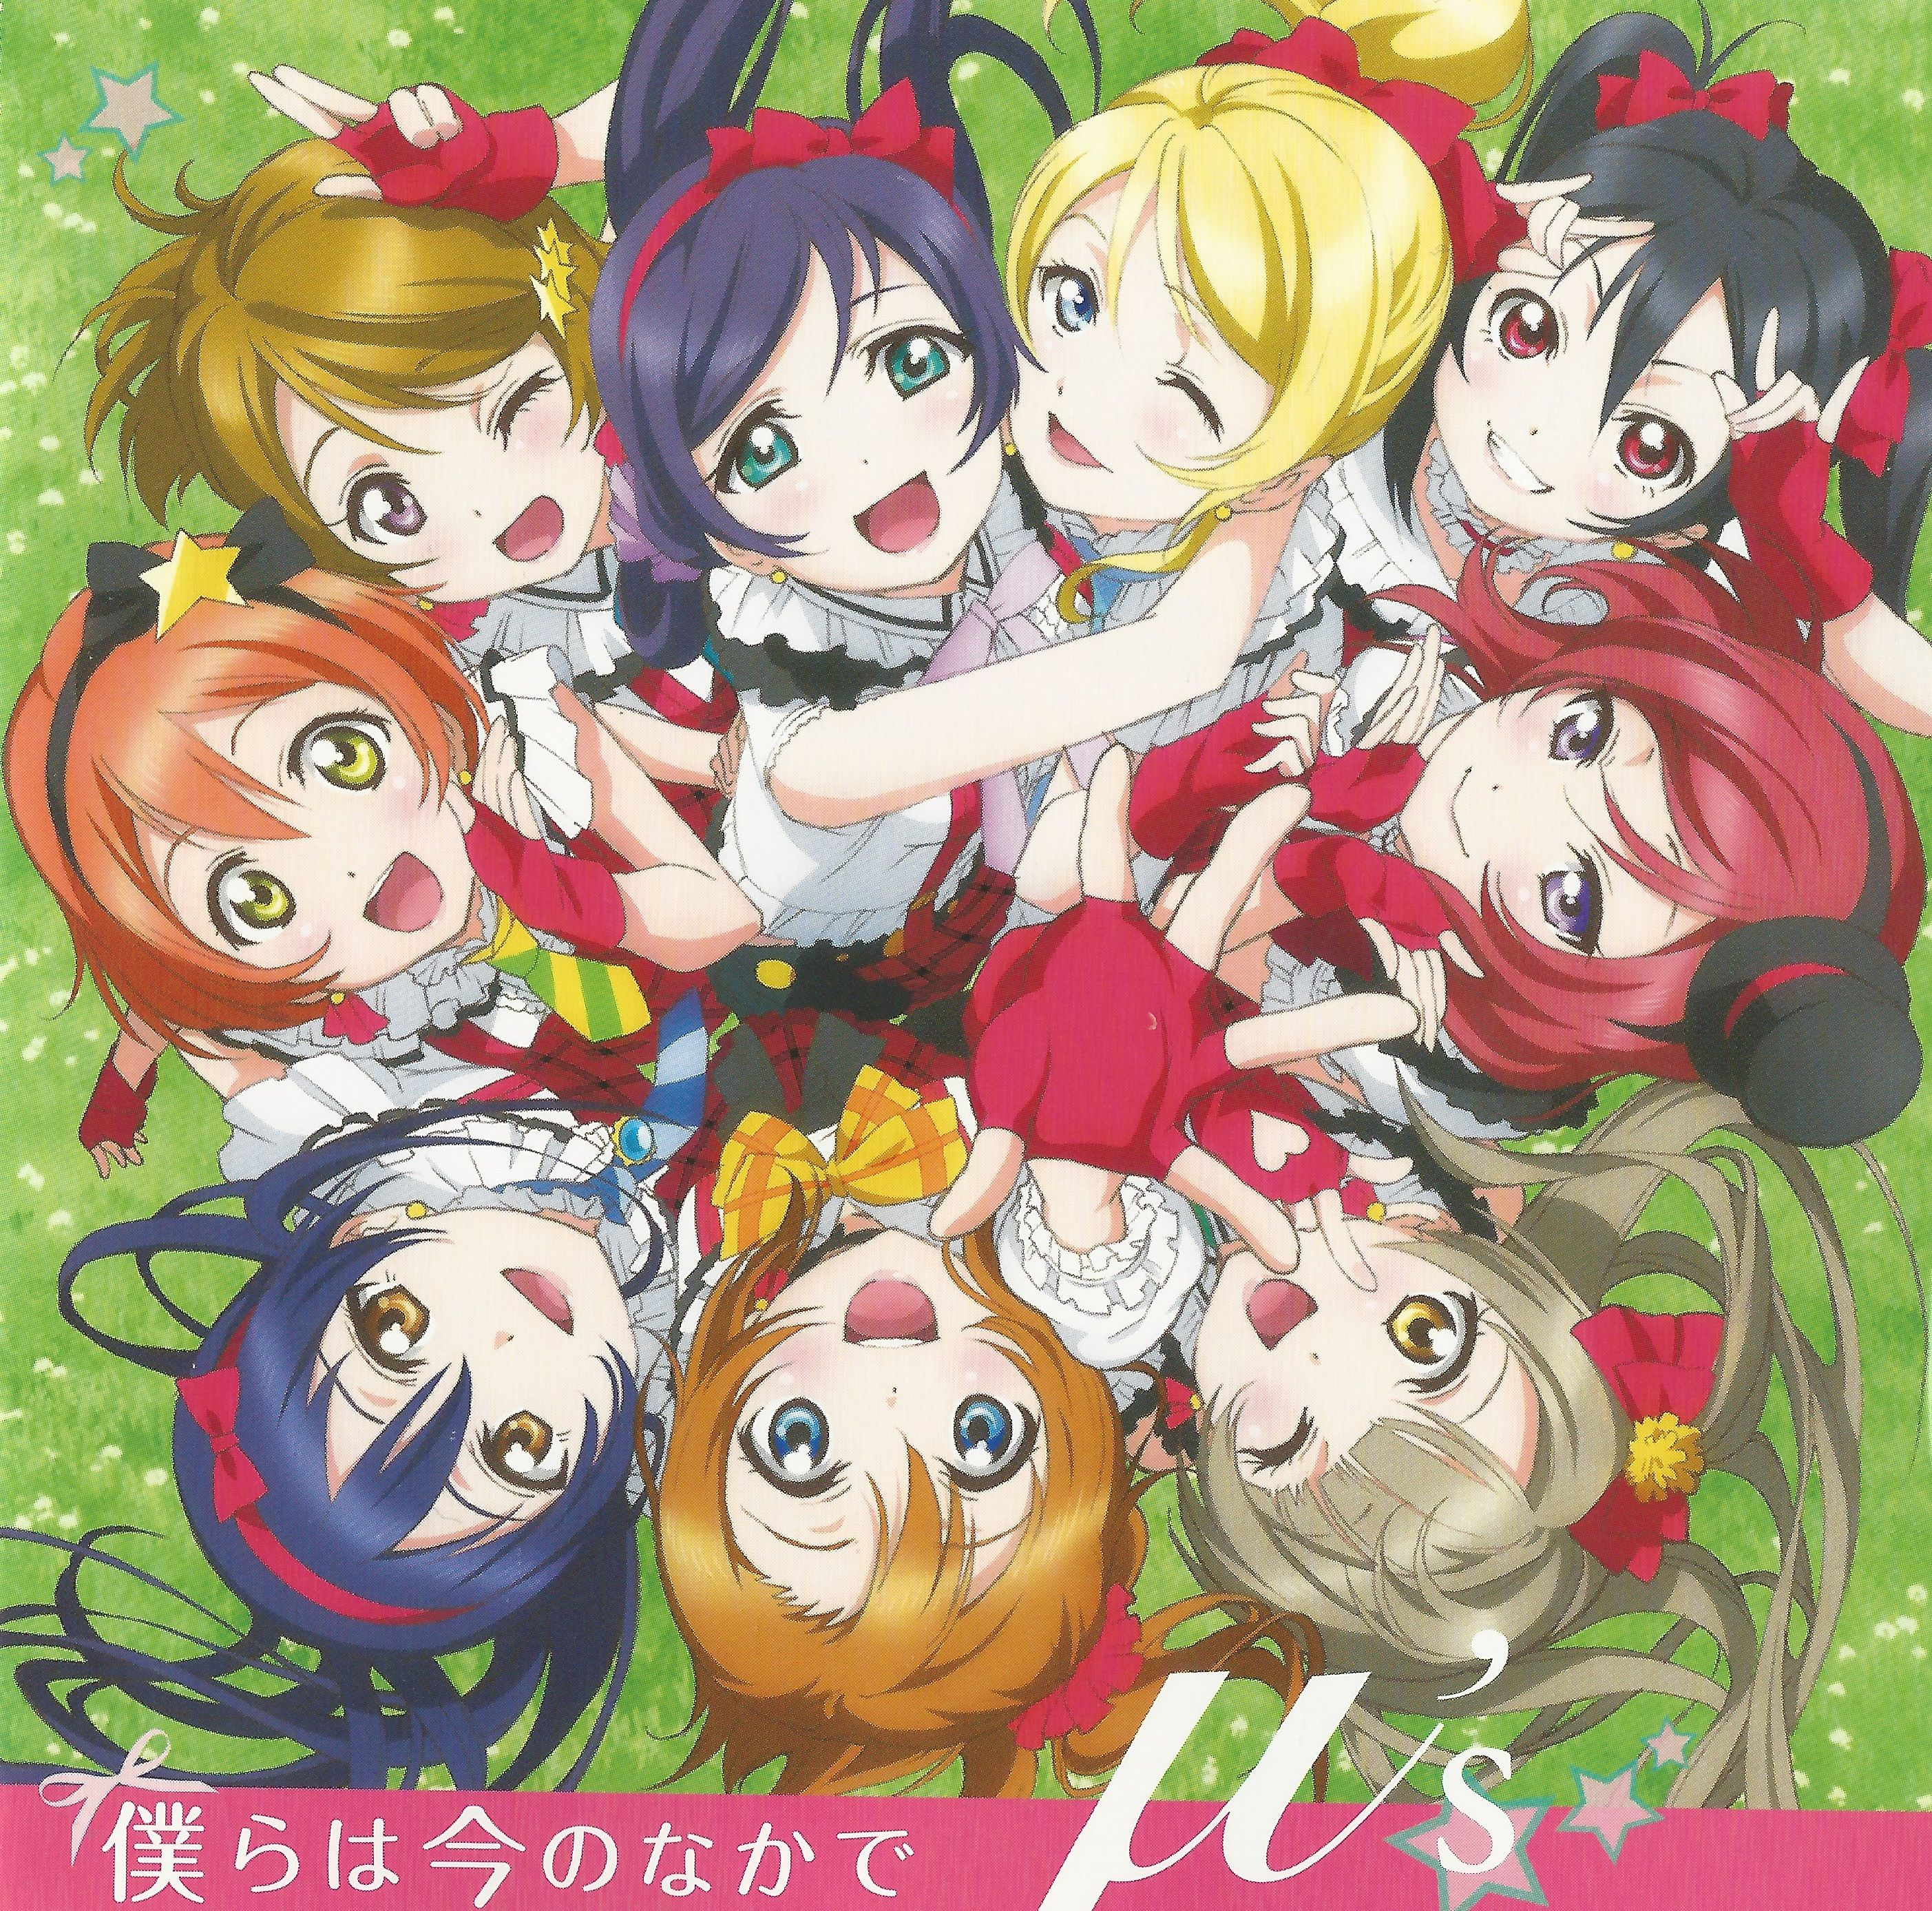 Love life school ️ Anime love, Anime smile, Anime